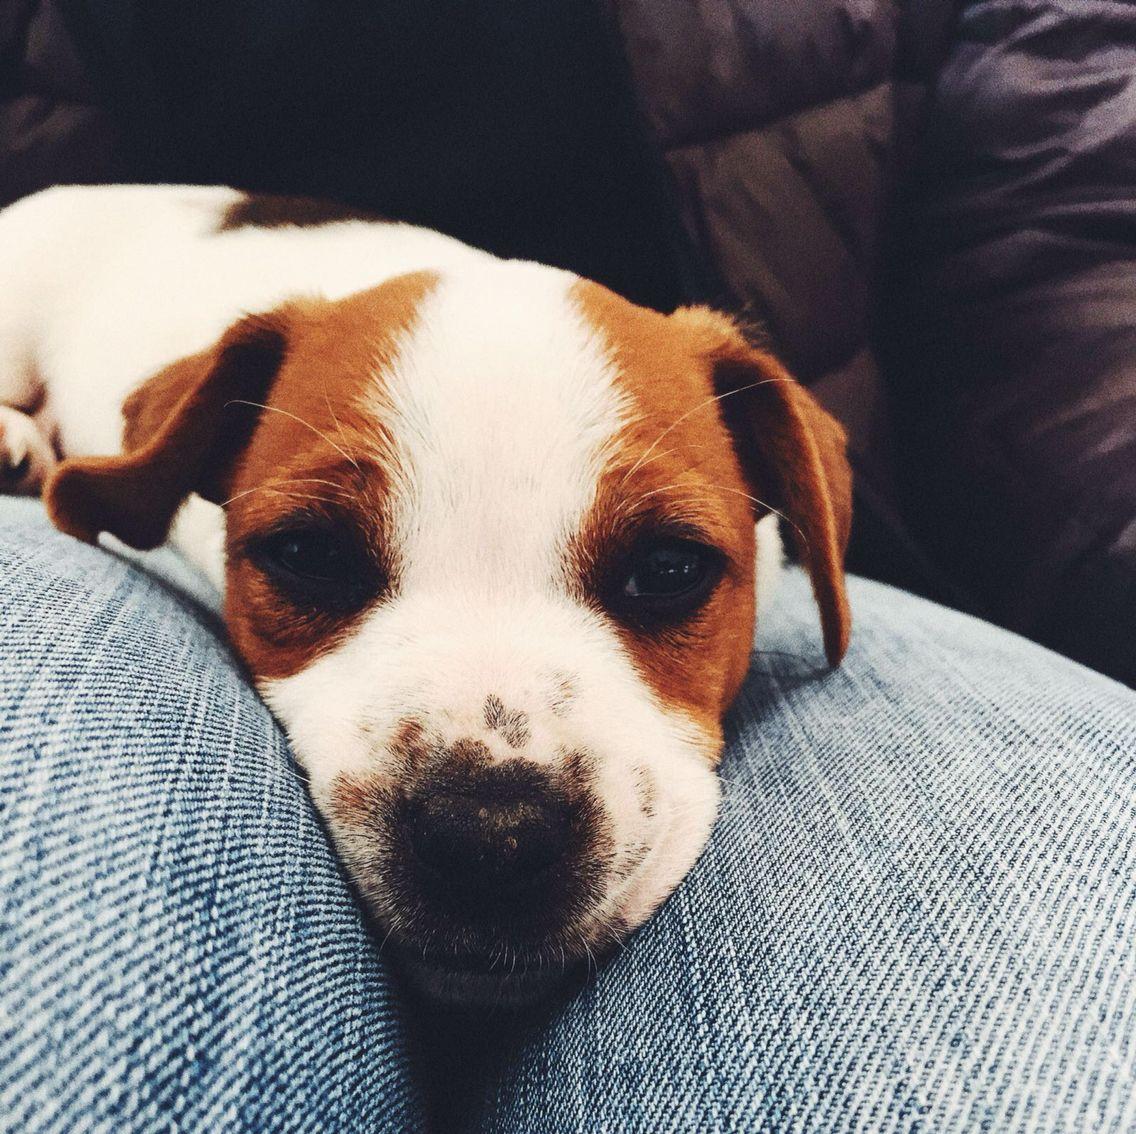 Ettore #dog #doggylove #animals